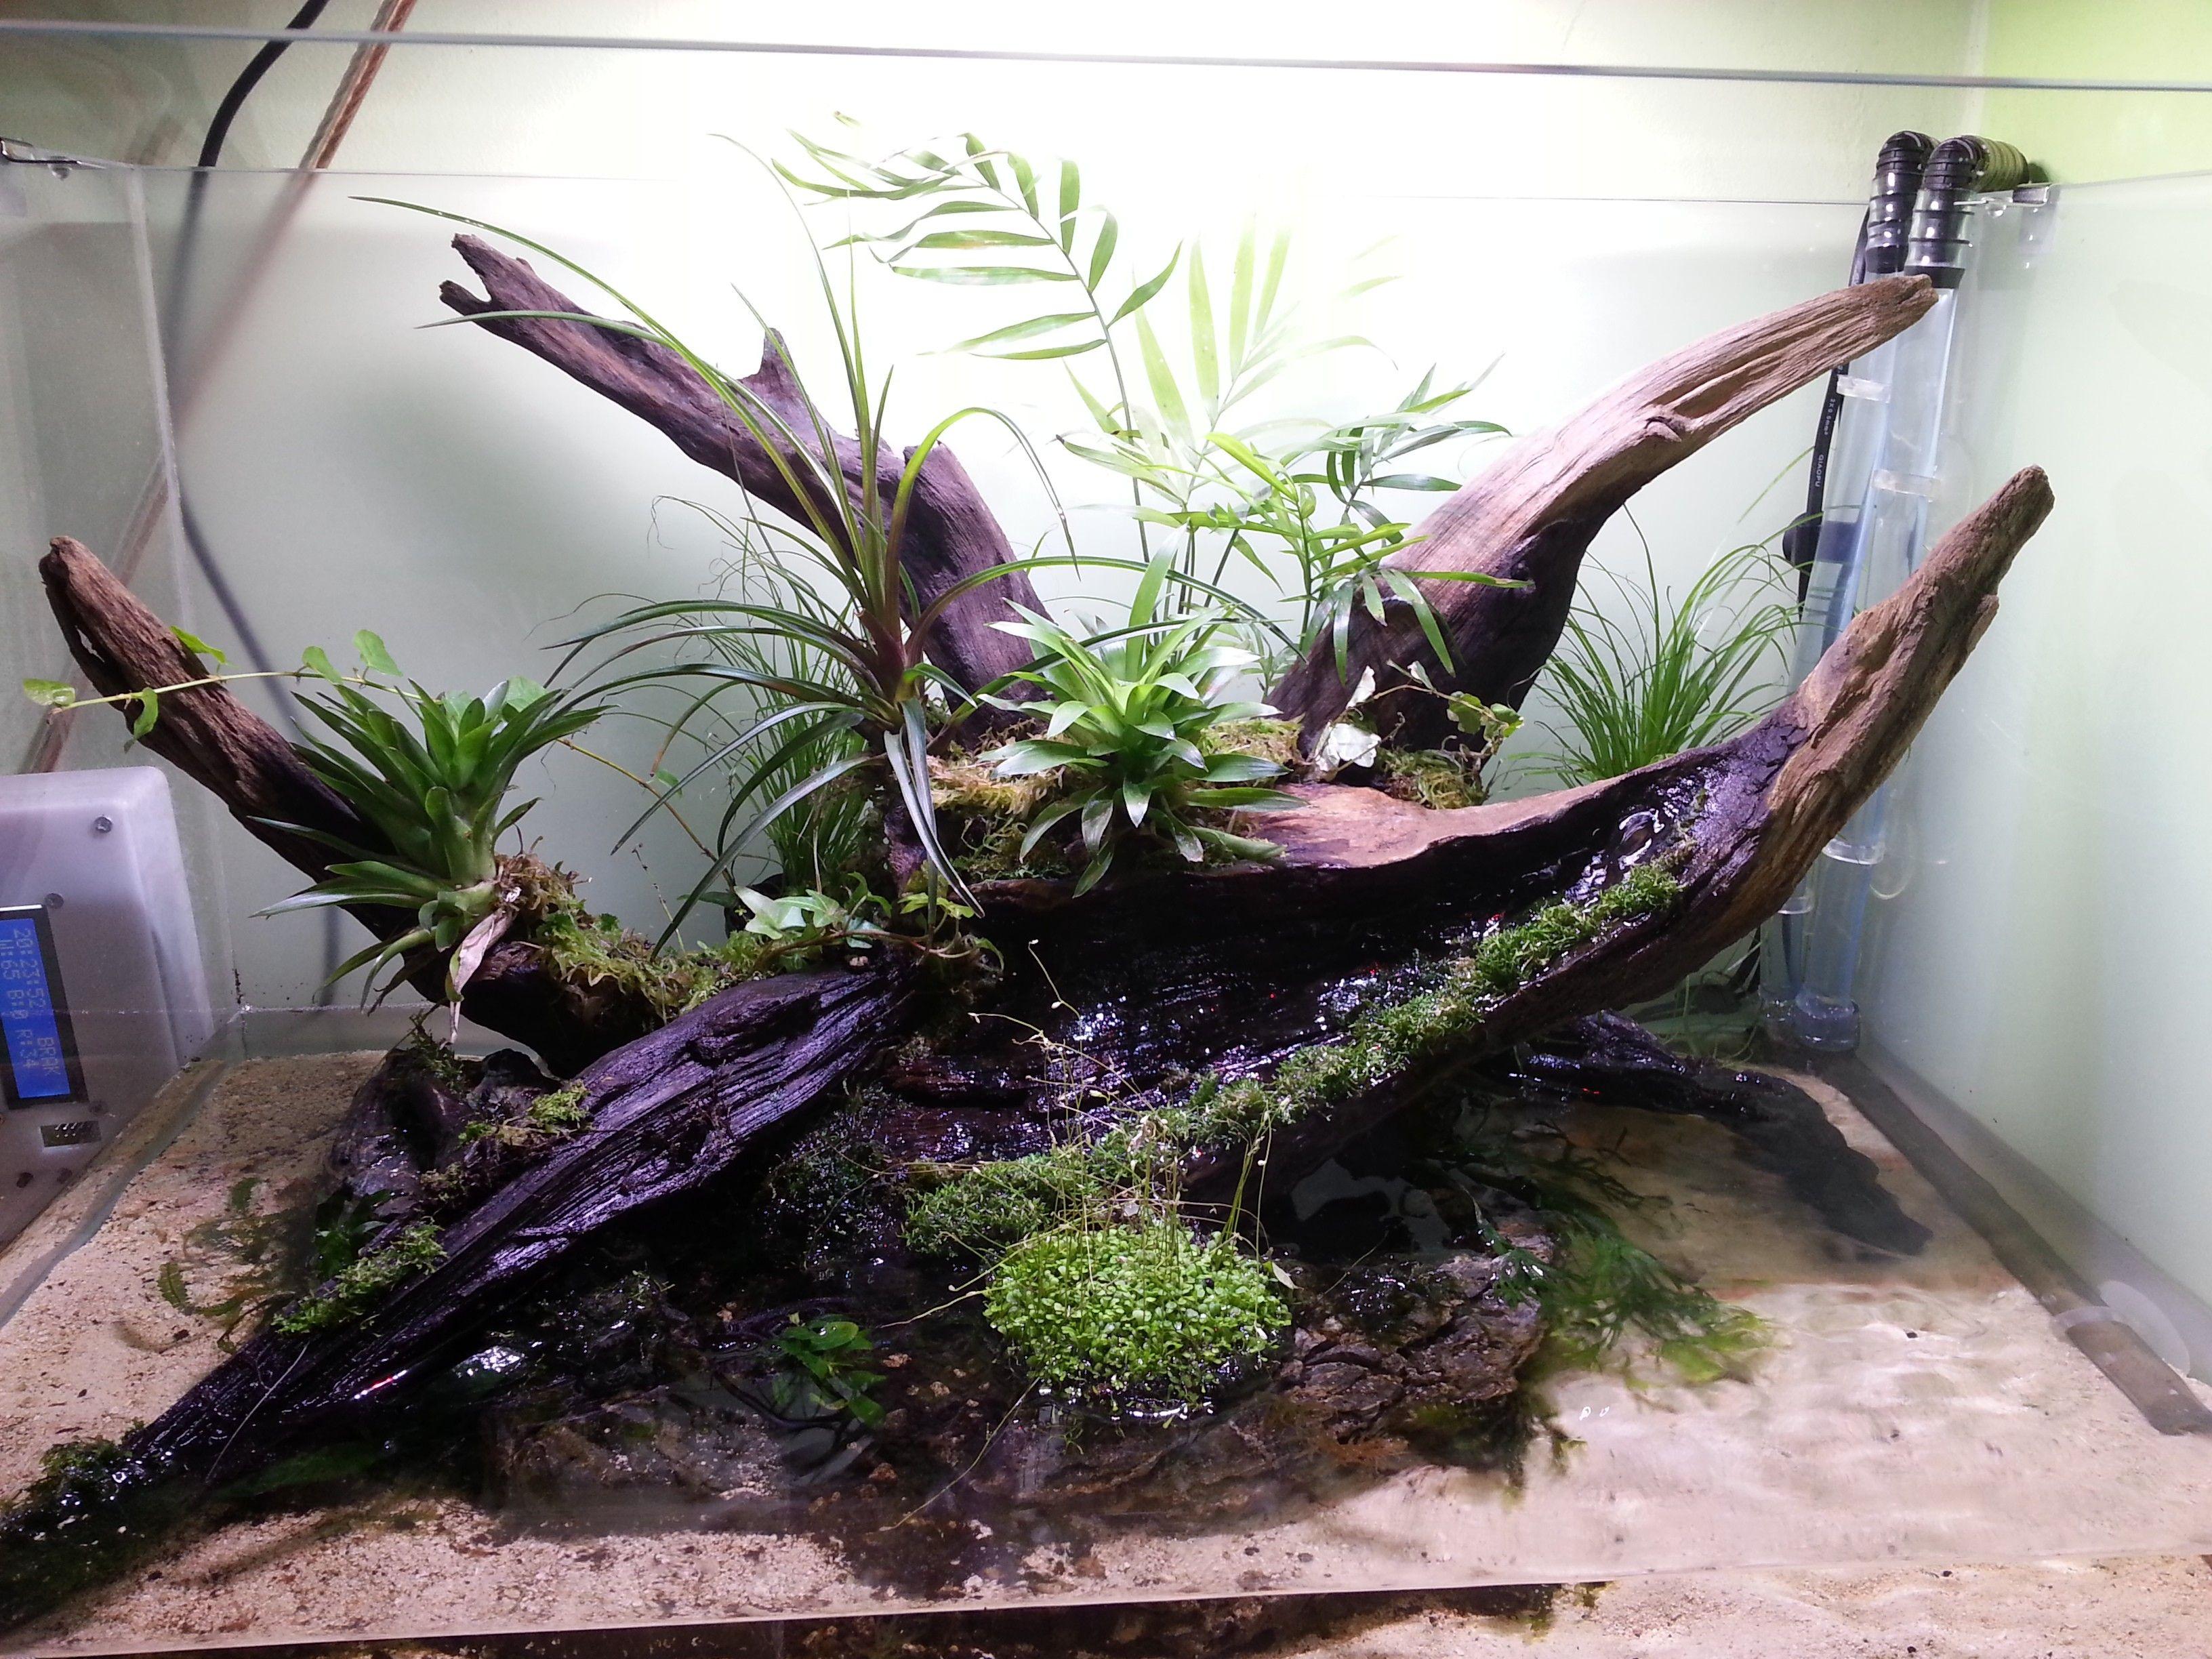 c513a6fcdb9ba9a7d7b26da3717c5540 Frais De Aquarium Osaka Concept